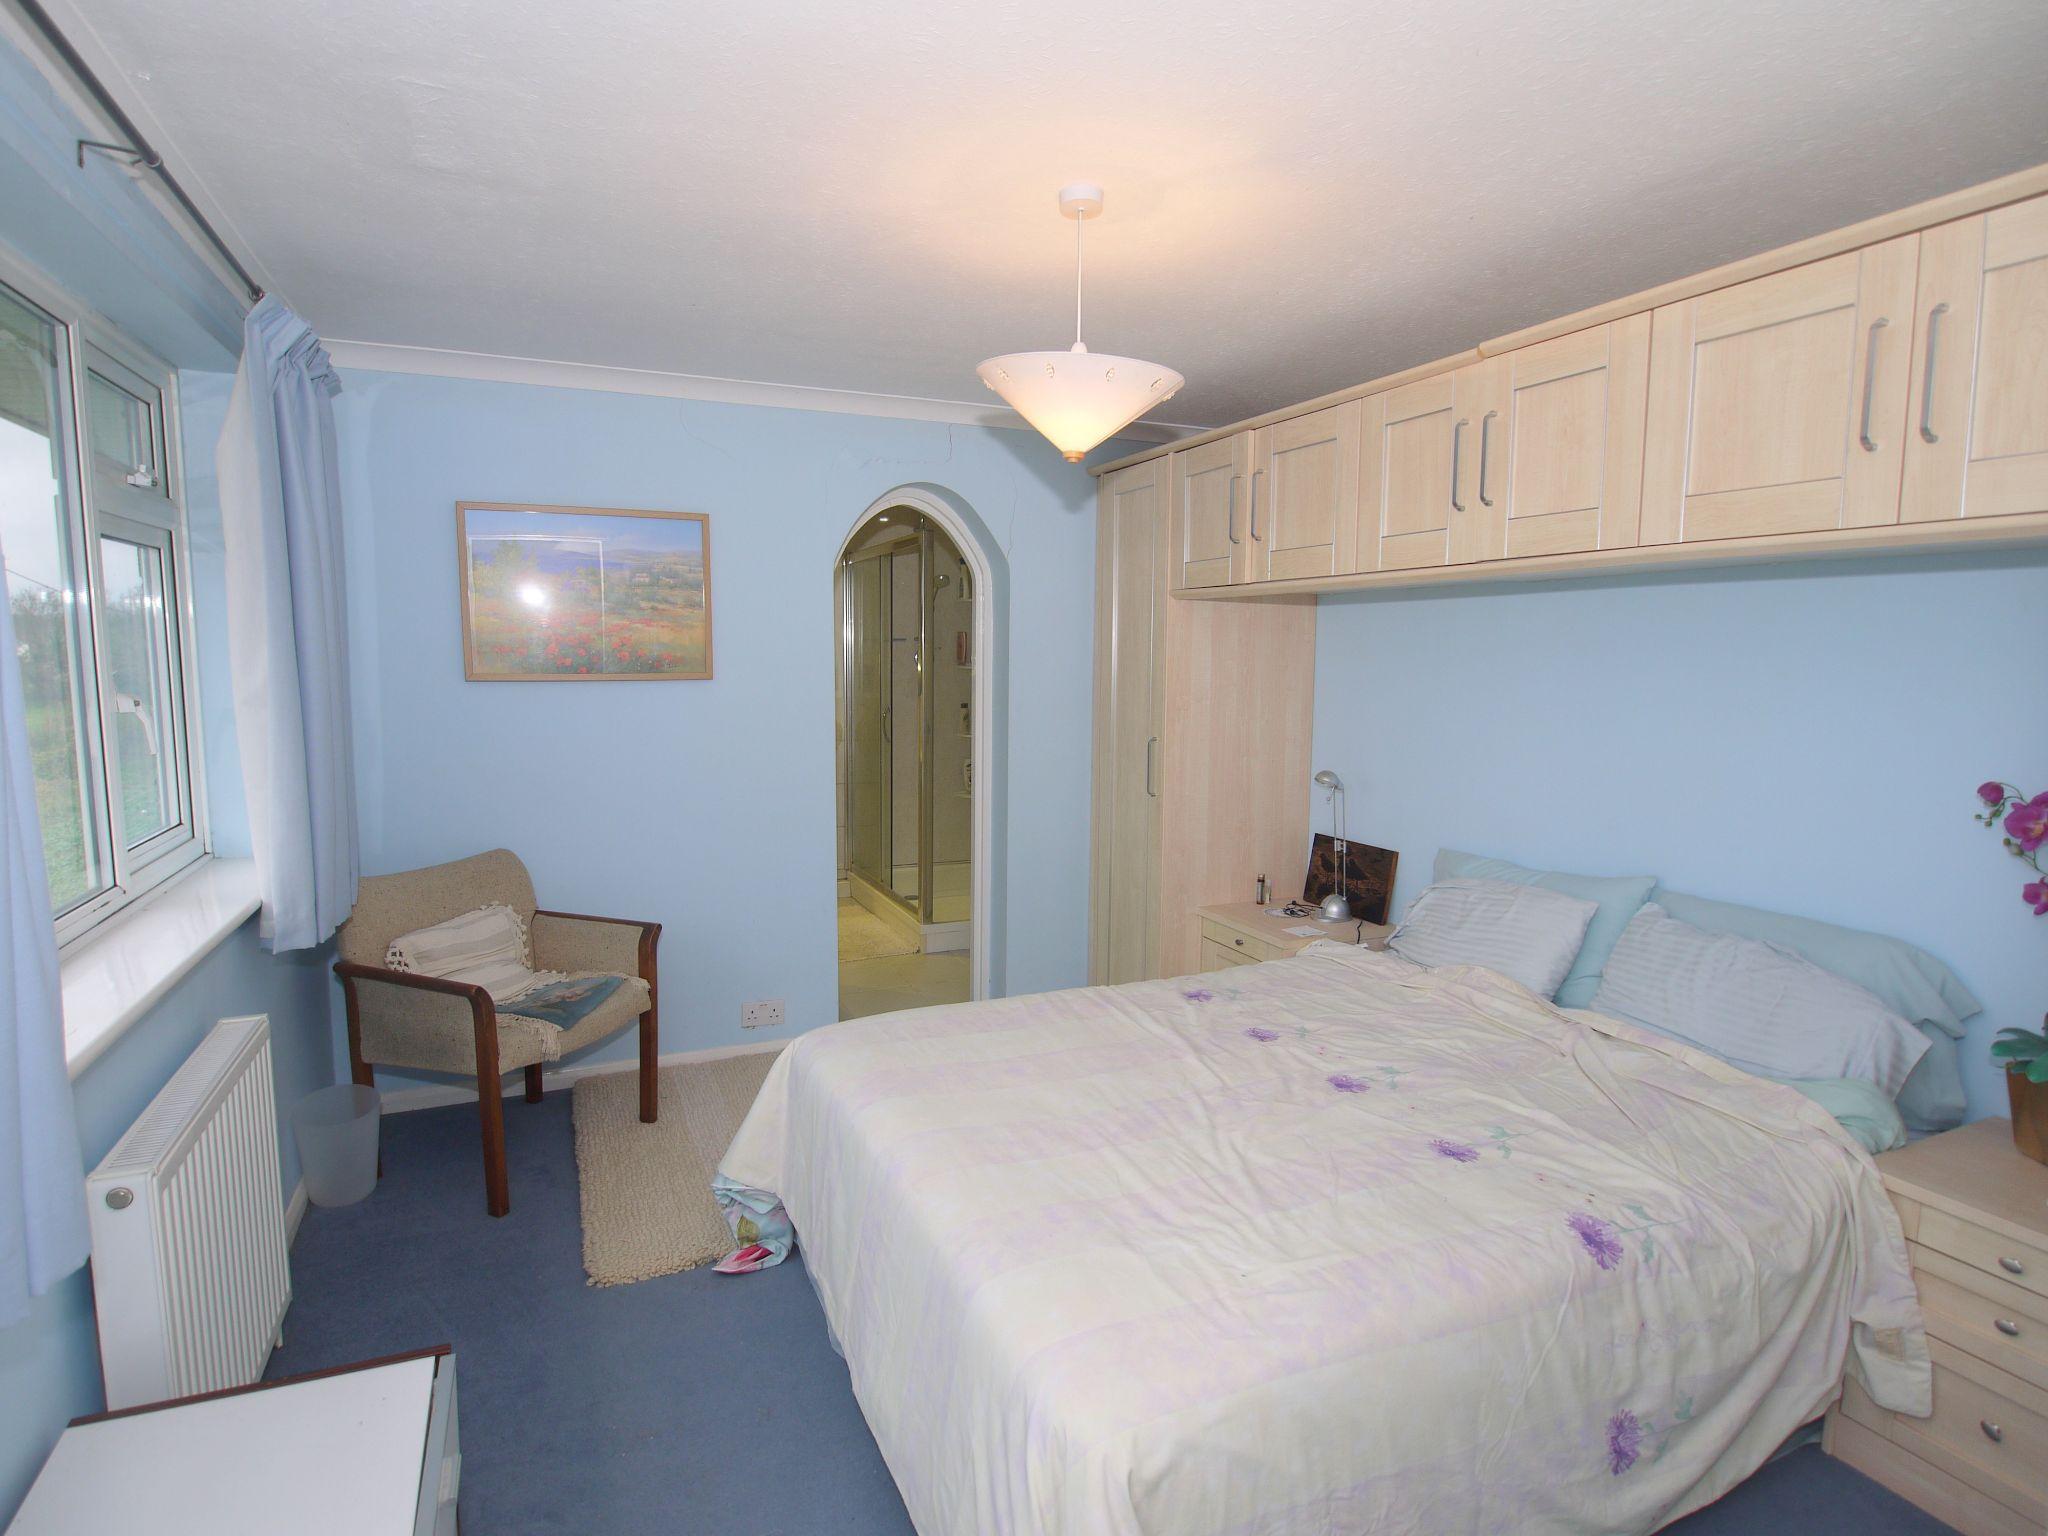 4 bedroom detached house Sold in Sevenoaks - Photograph 6